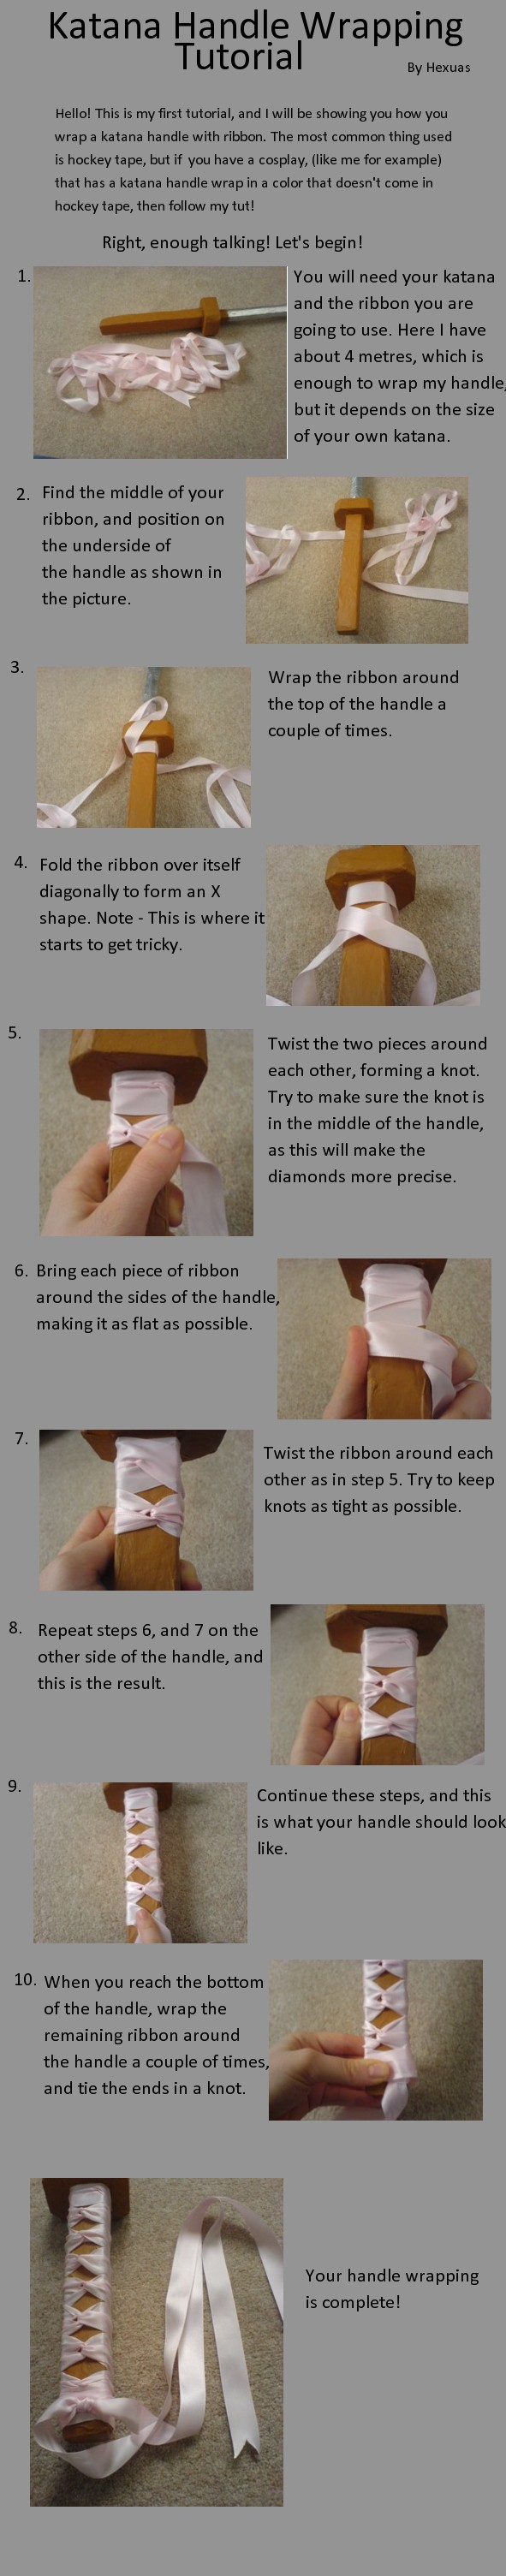 Katana Handle Wrapping Tut by Hexuas